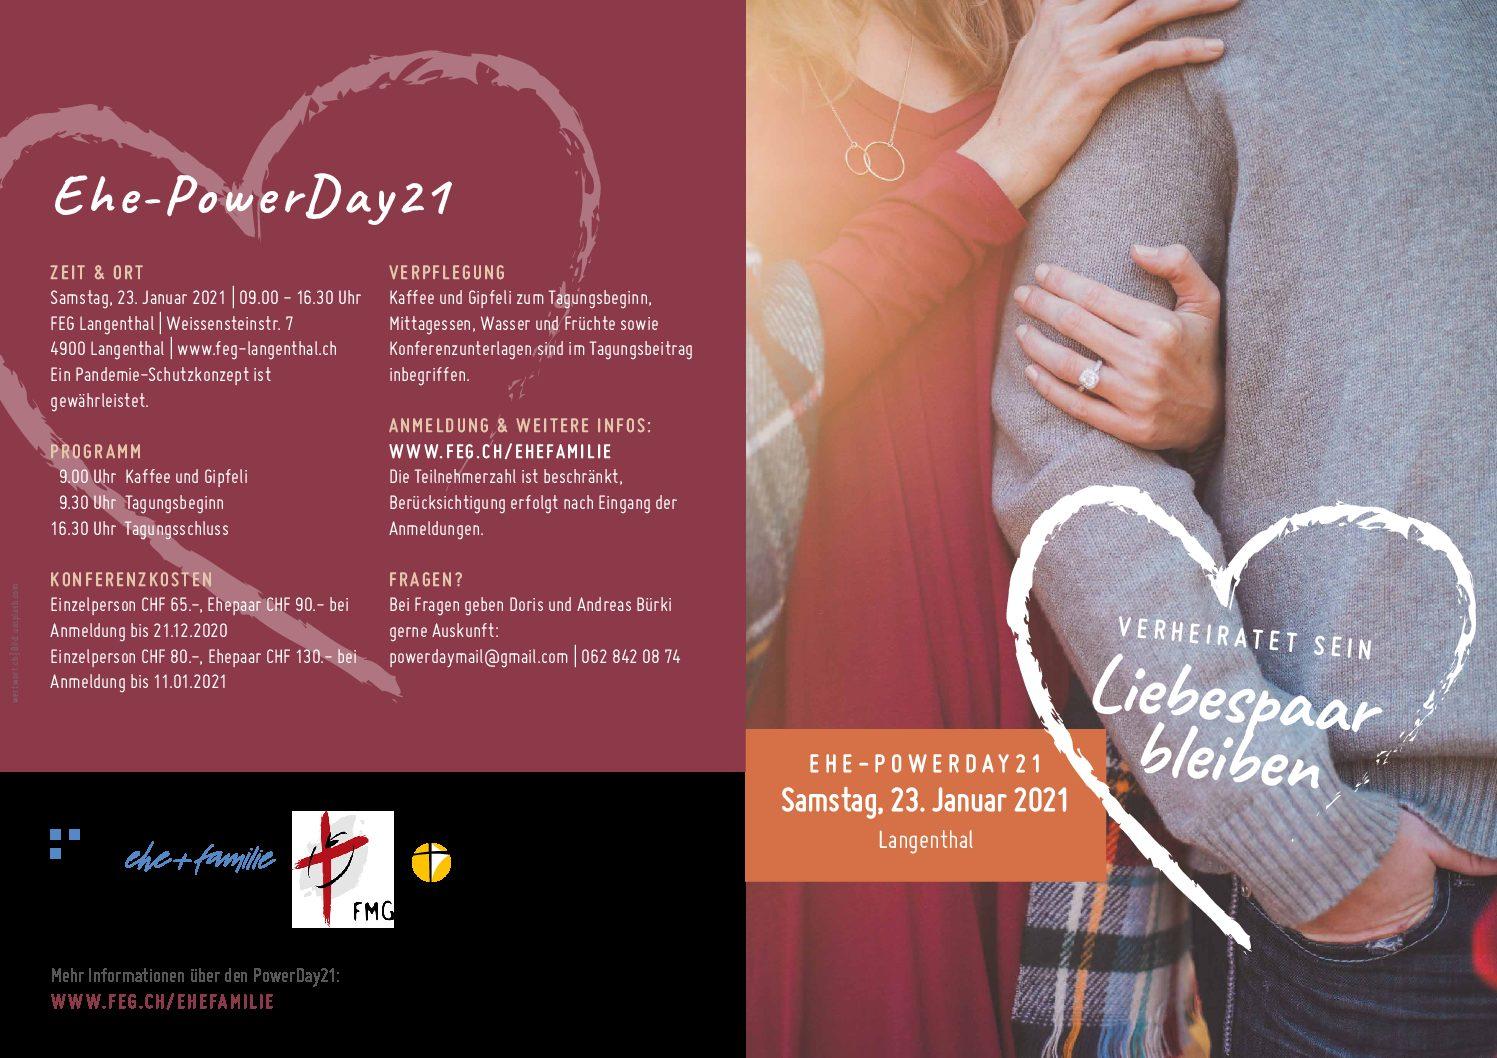 Ehe-Powerday 21